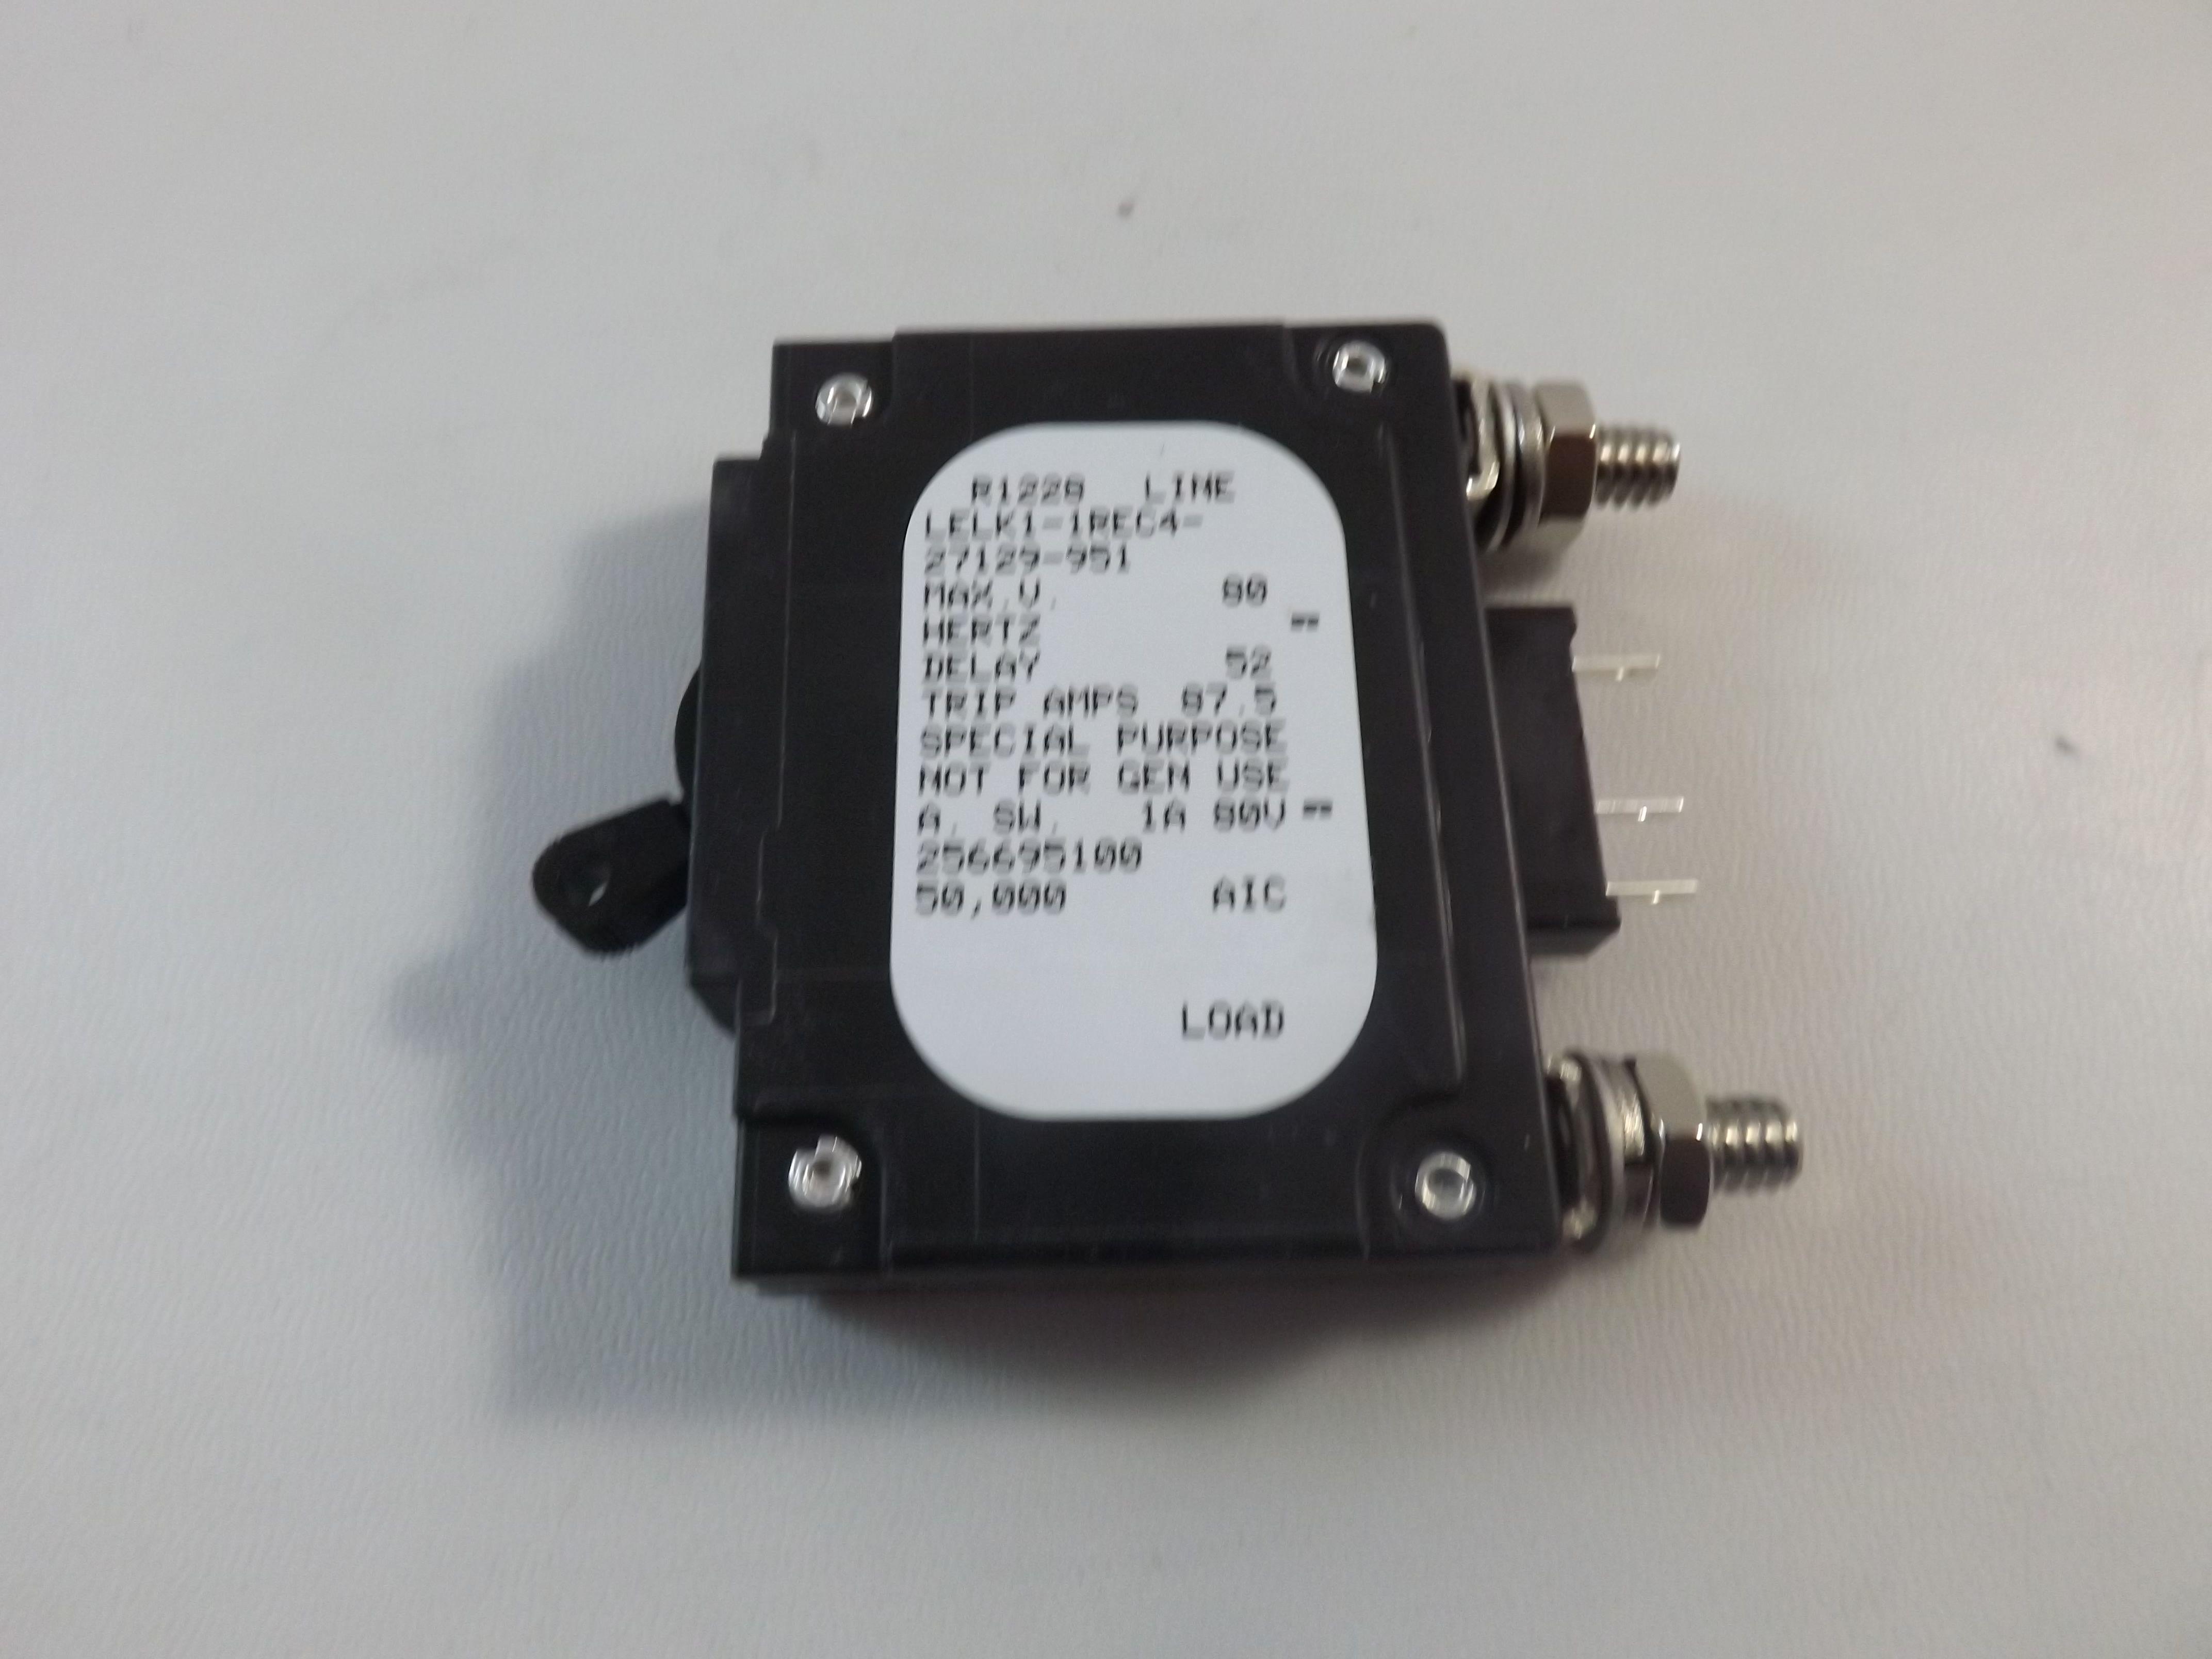 Airpax LELK1-1REC4-27129-951 New 256695100 Breaker 70 Amp